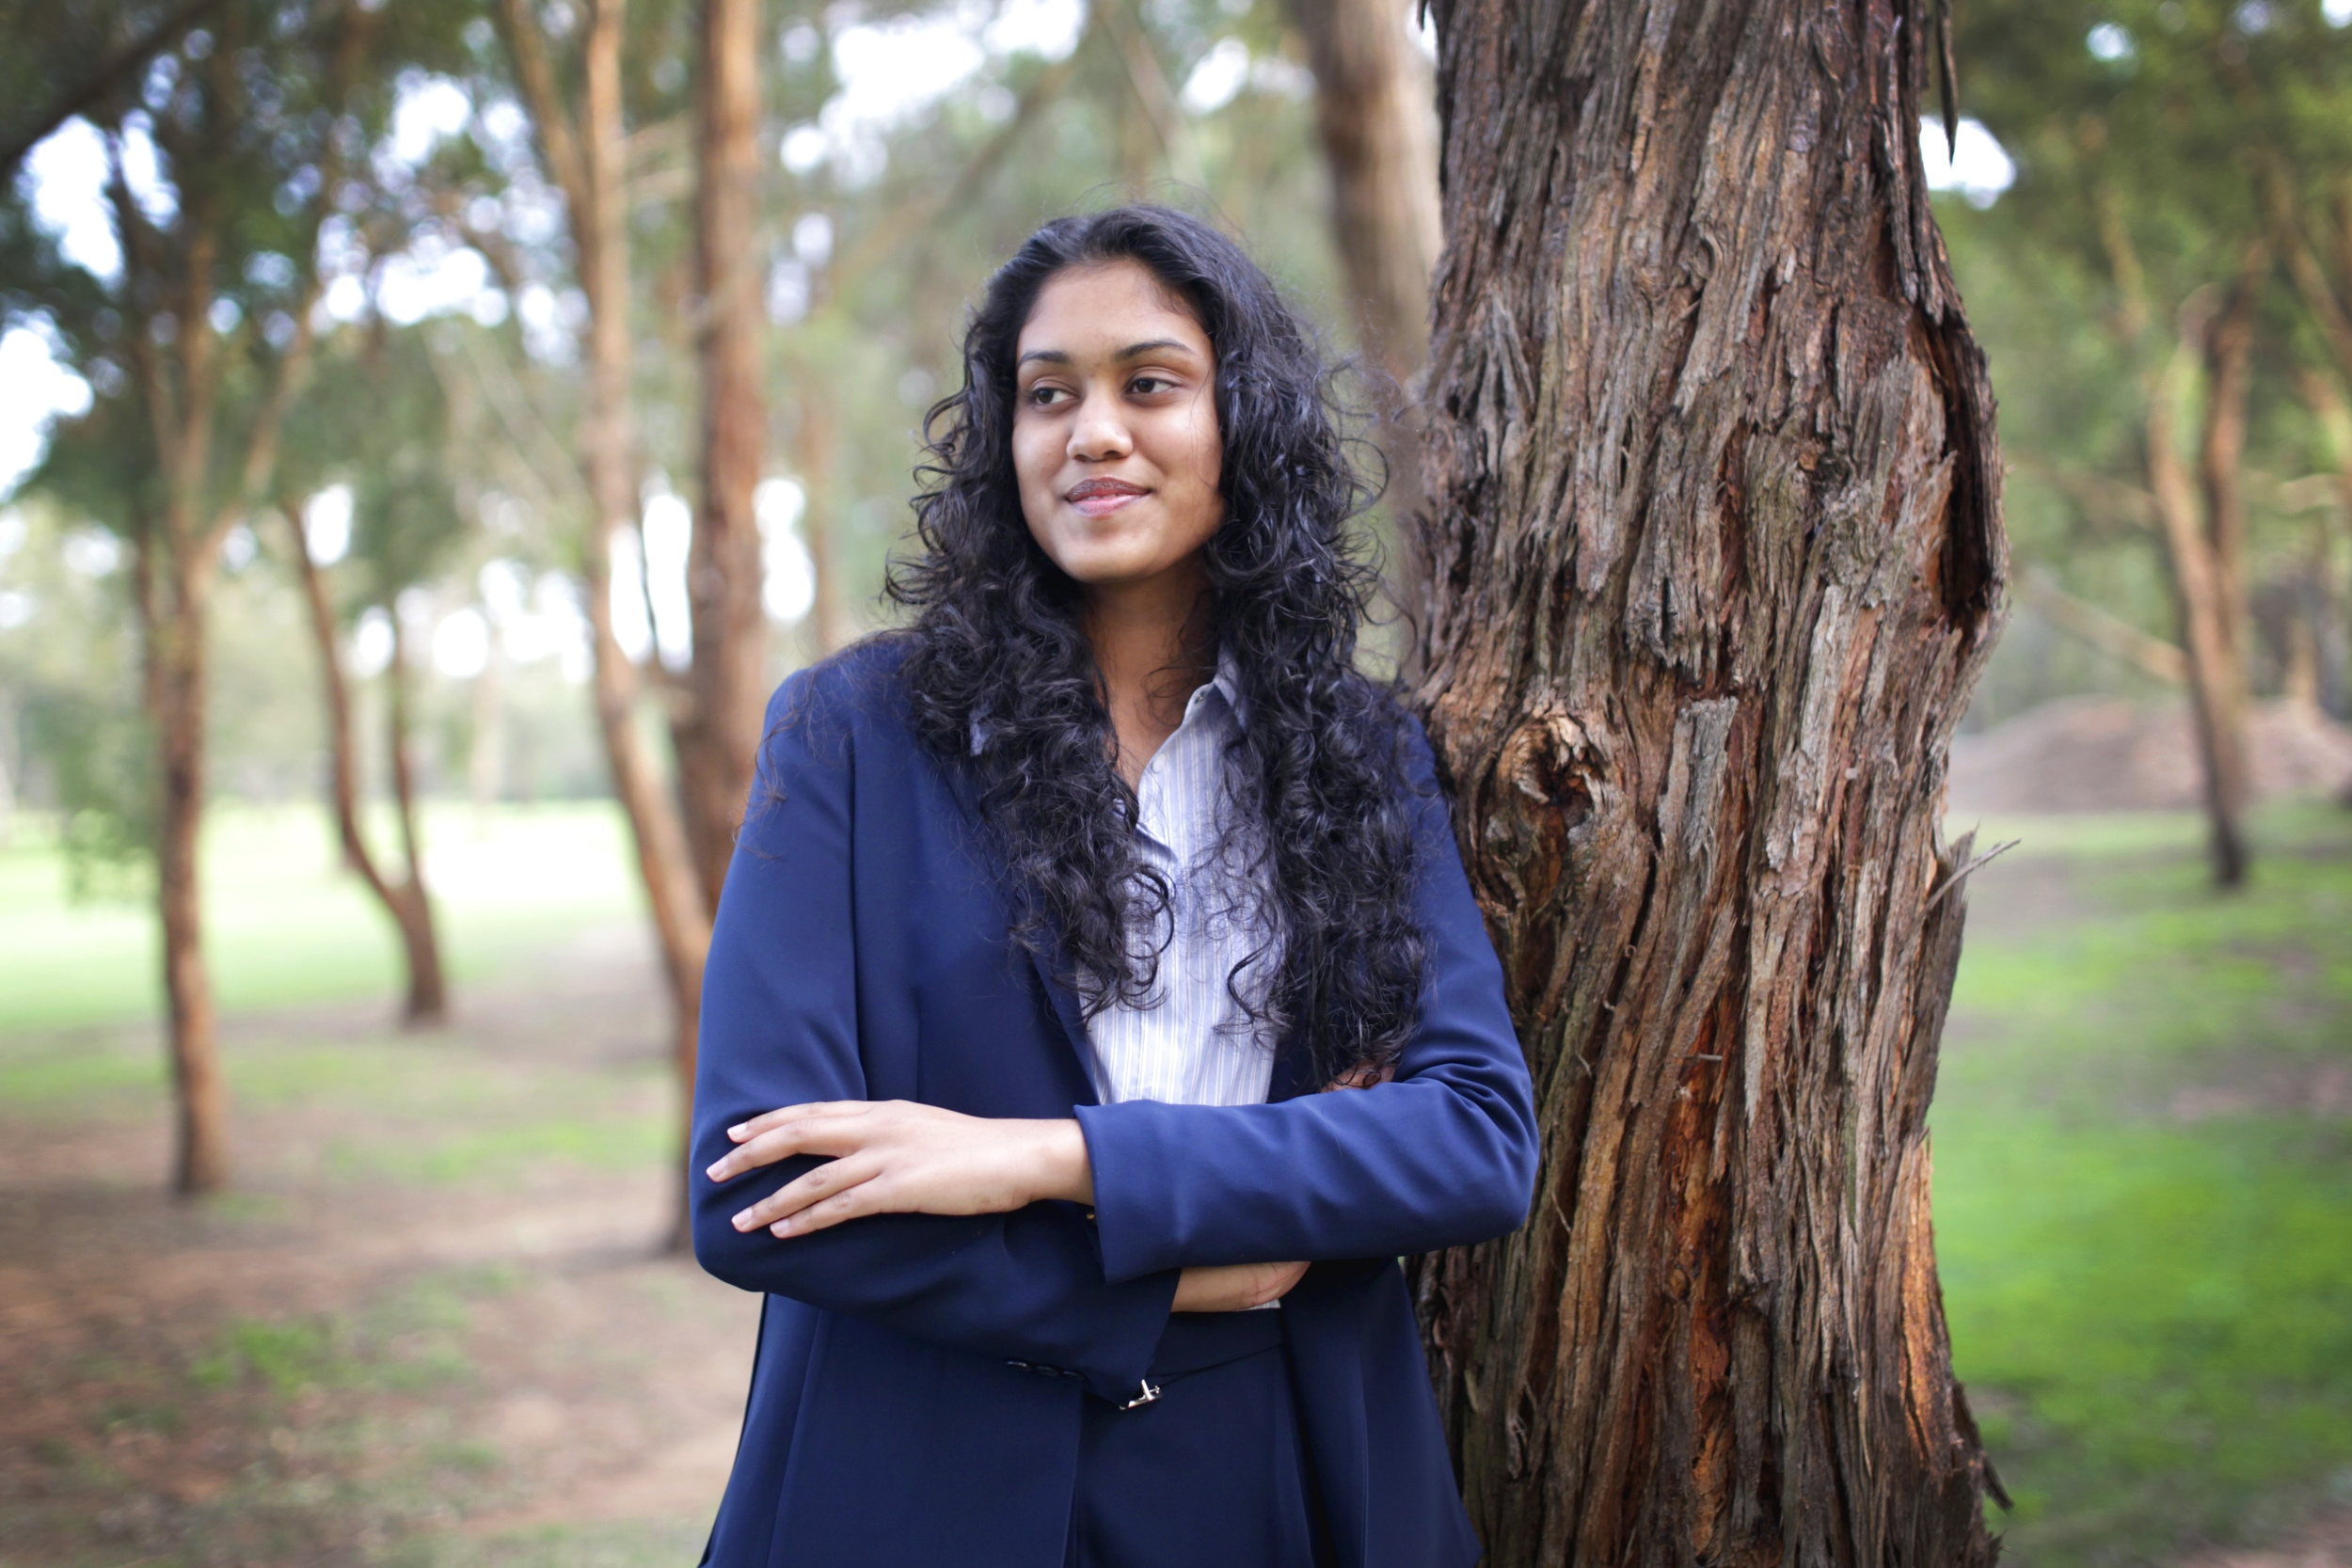 Sheneli Meneripitiyage Dona. Picture: Bennett Photography